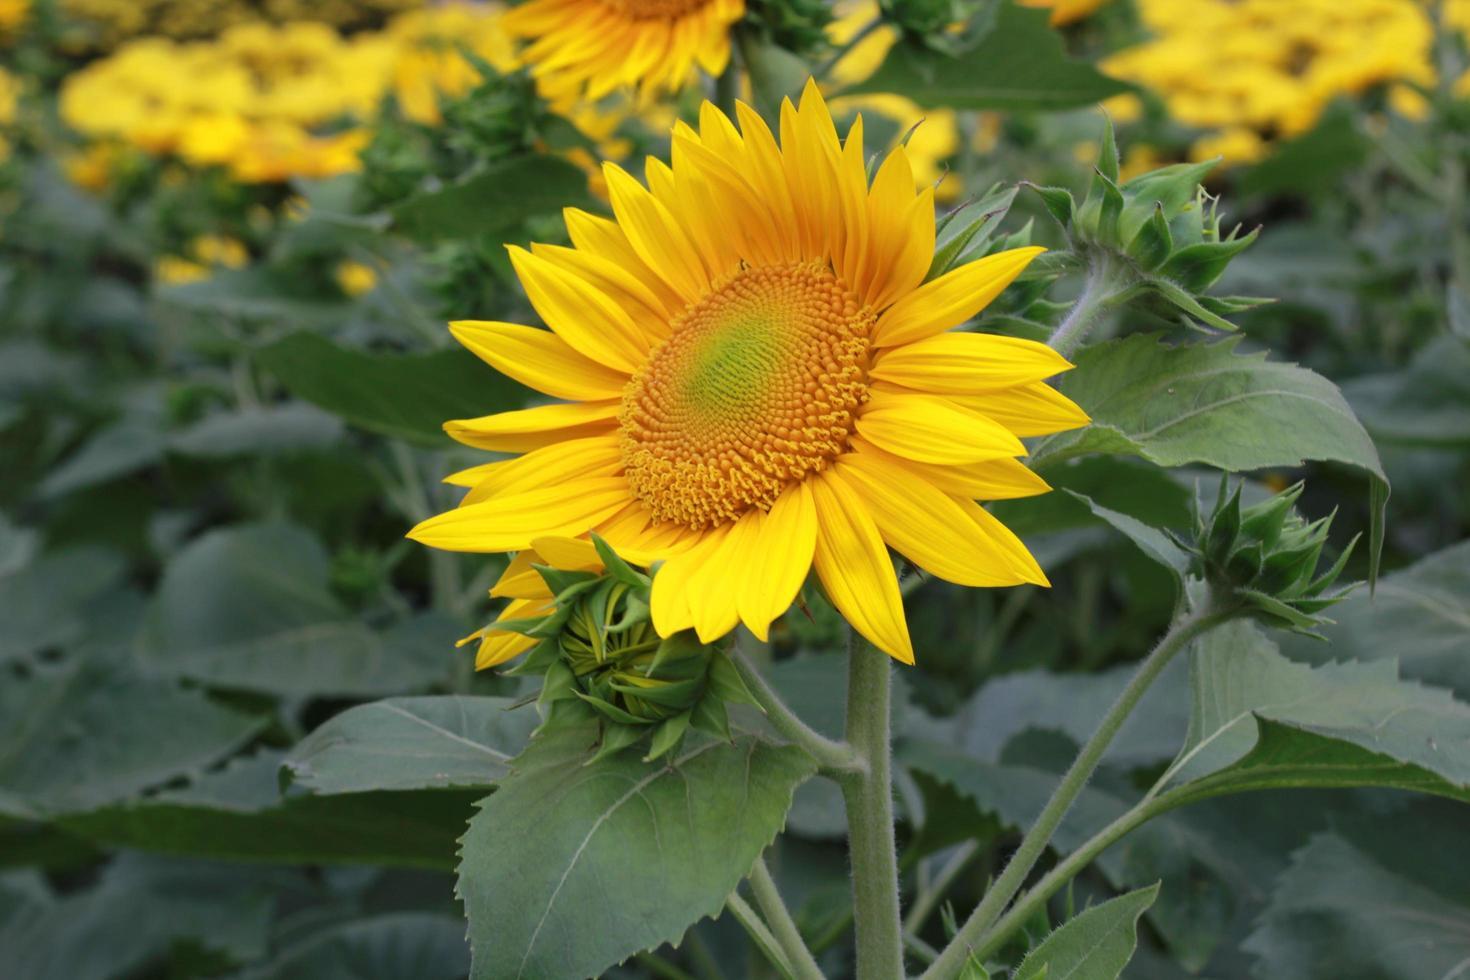 close-up foto van zonnebloem